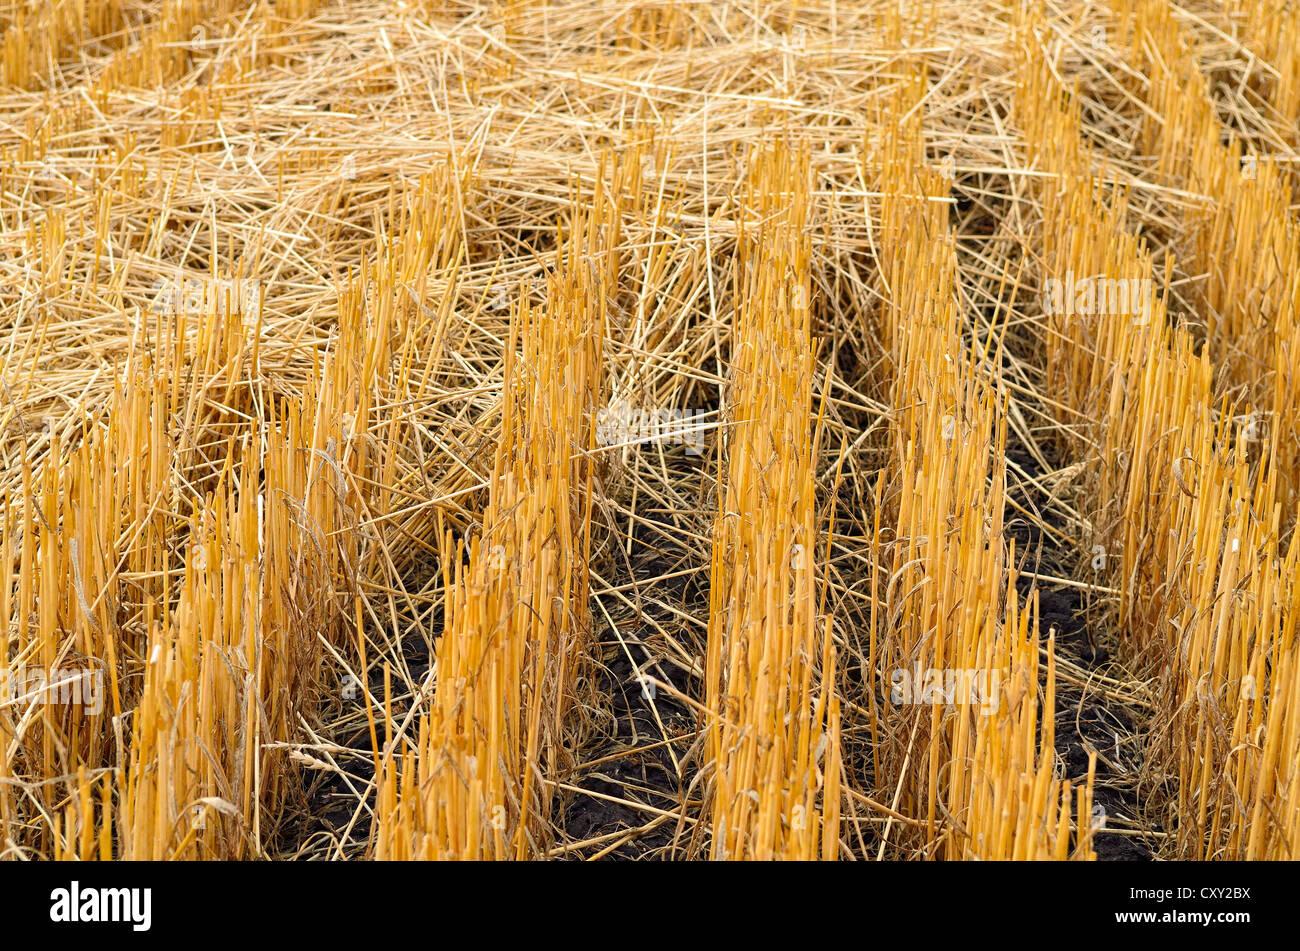 Harvested grain field near Moscow, Highway 95, Idaho, USA - Stock Image